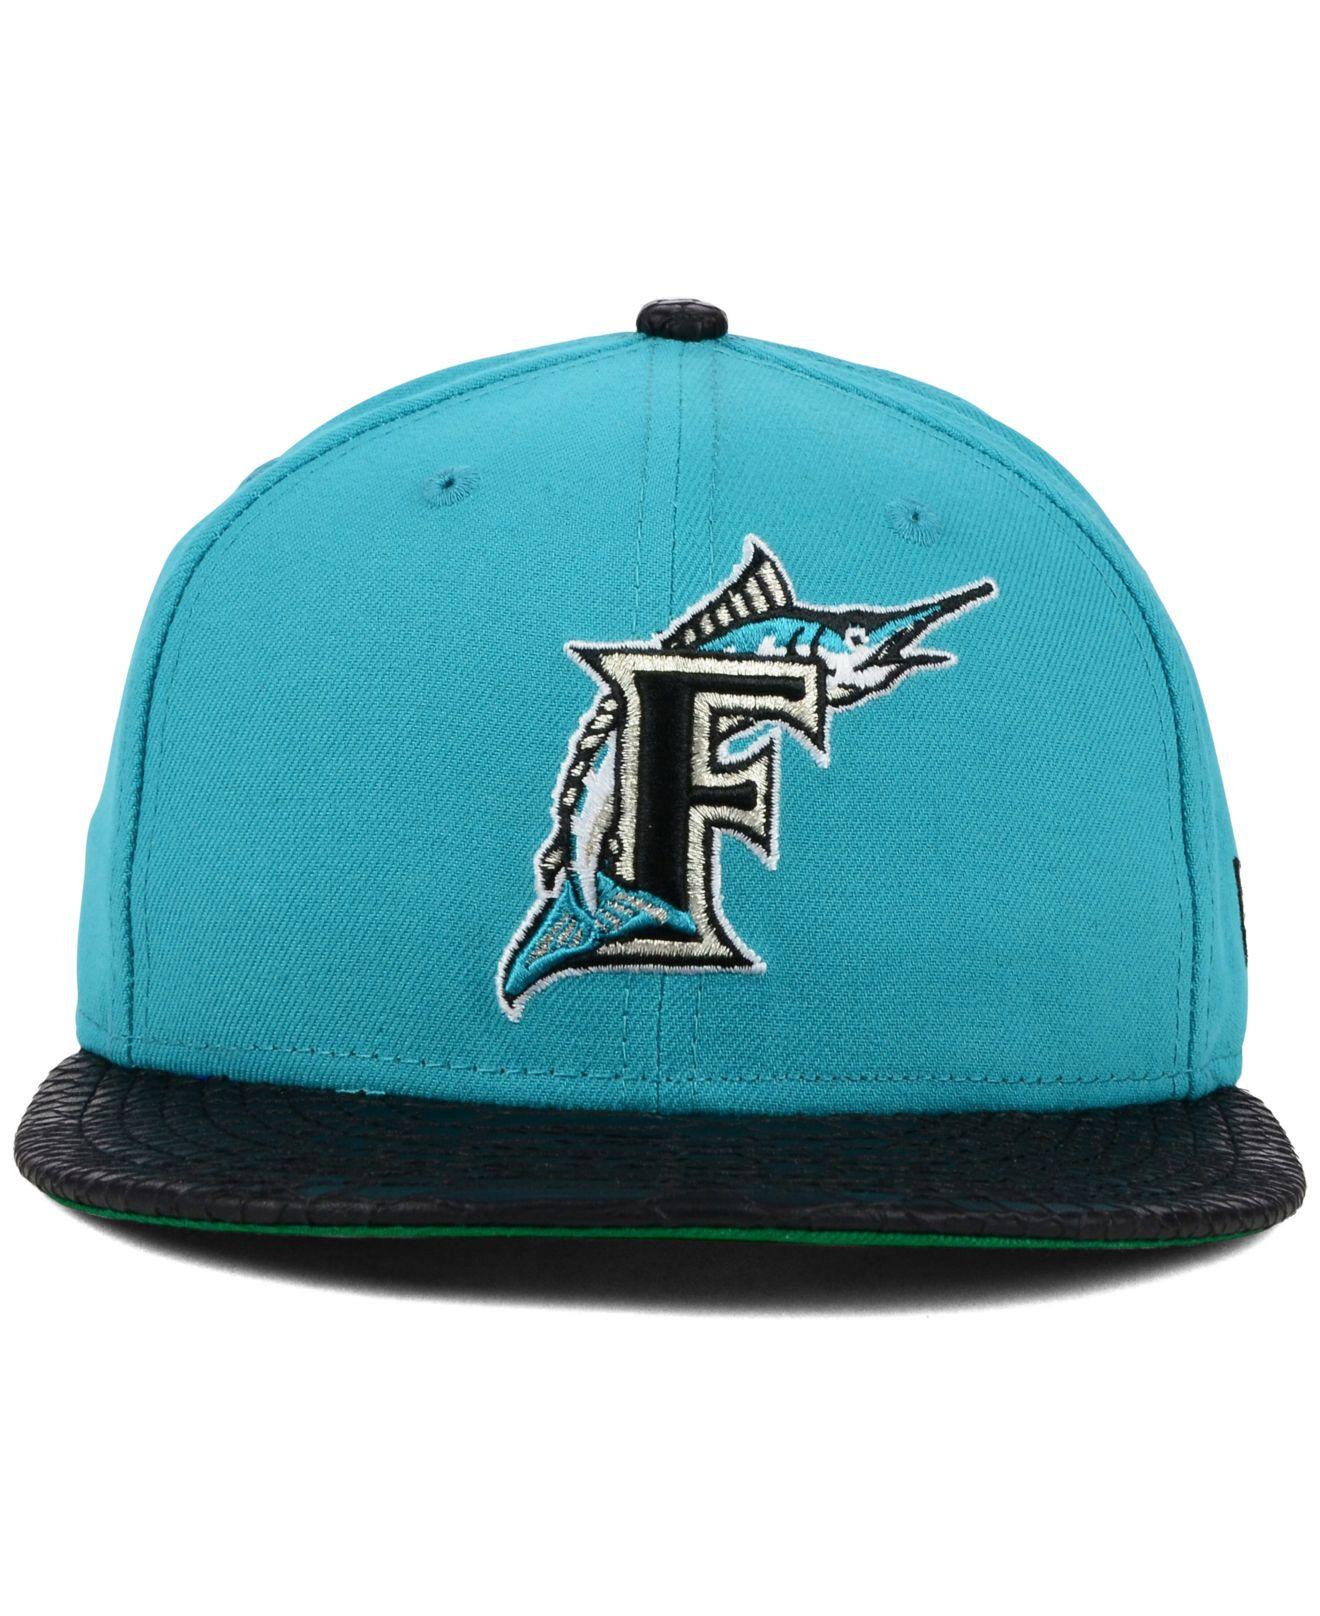 quality design e7e4d ae299 Lyst - Ktz Florida Marlins Mlb Team Python 59fifty Cap in Blue for Men